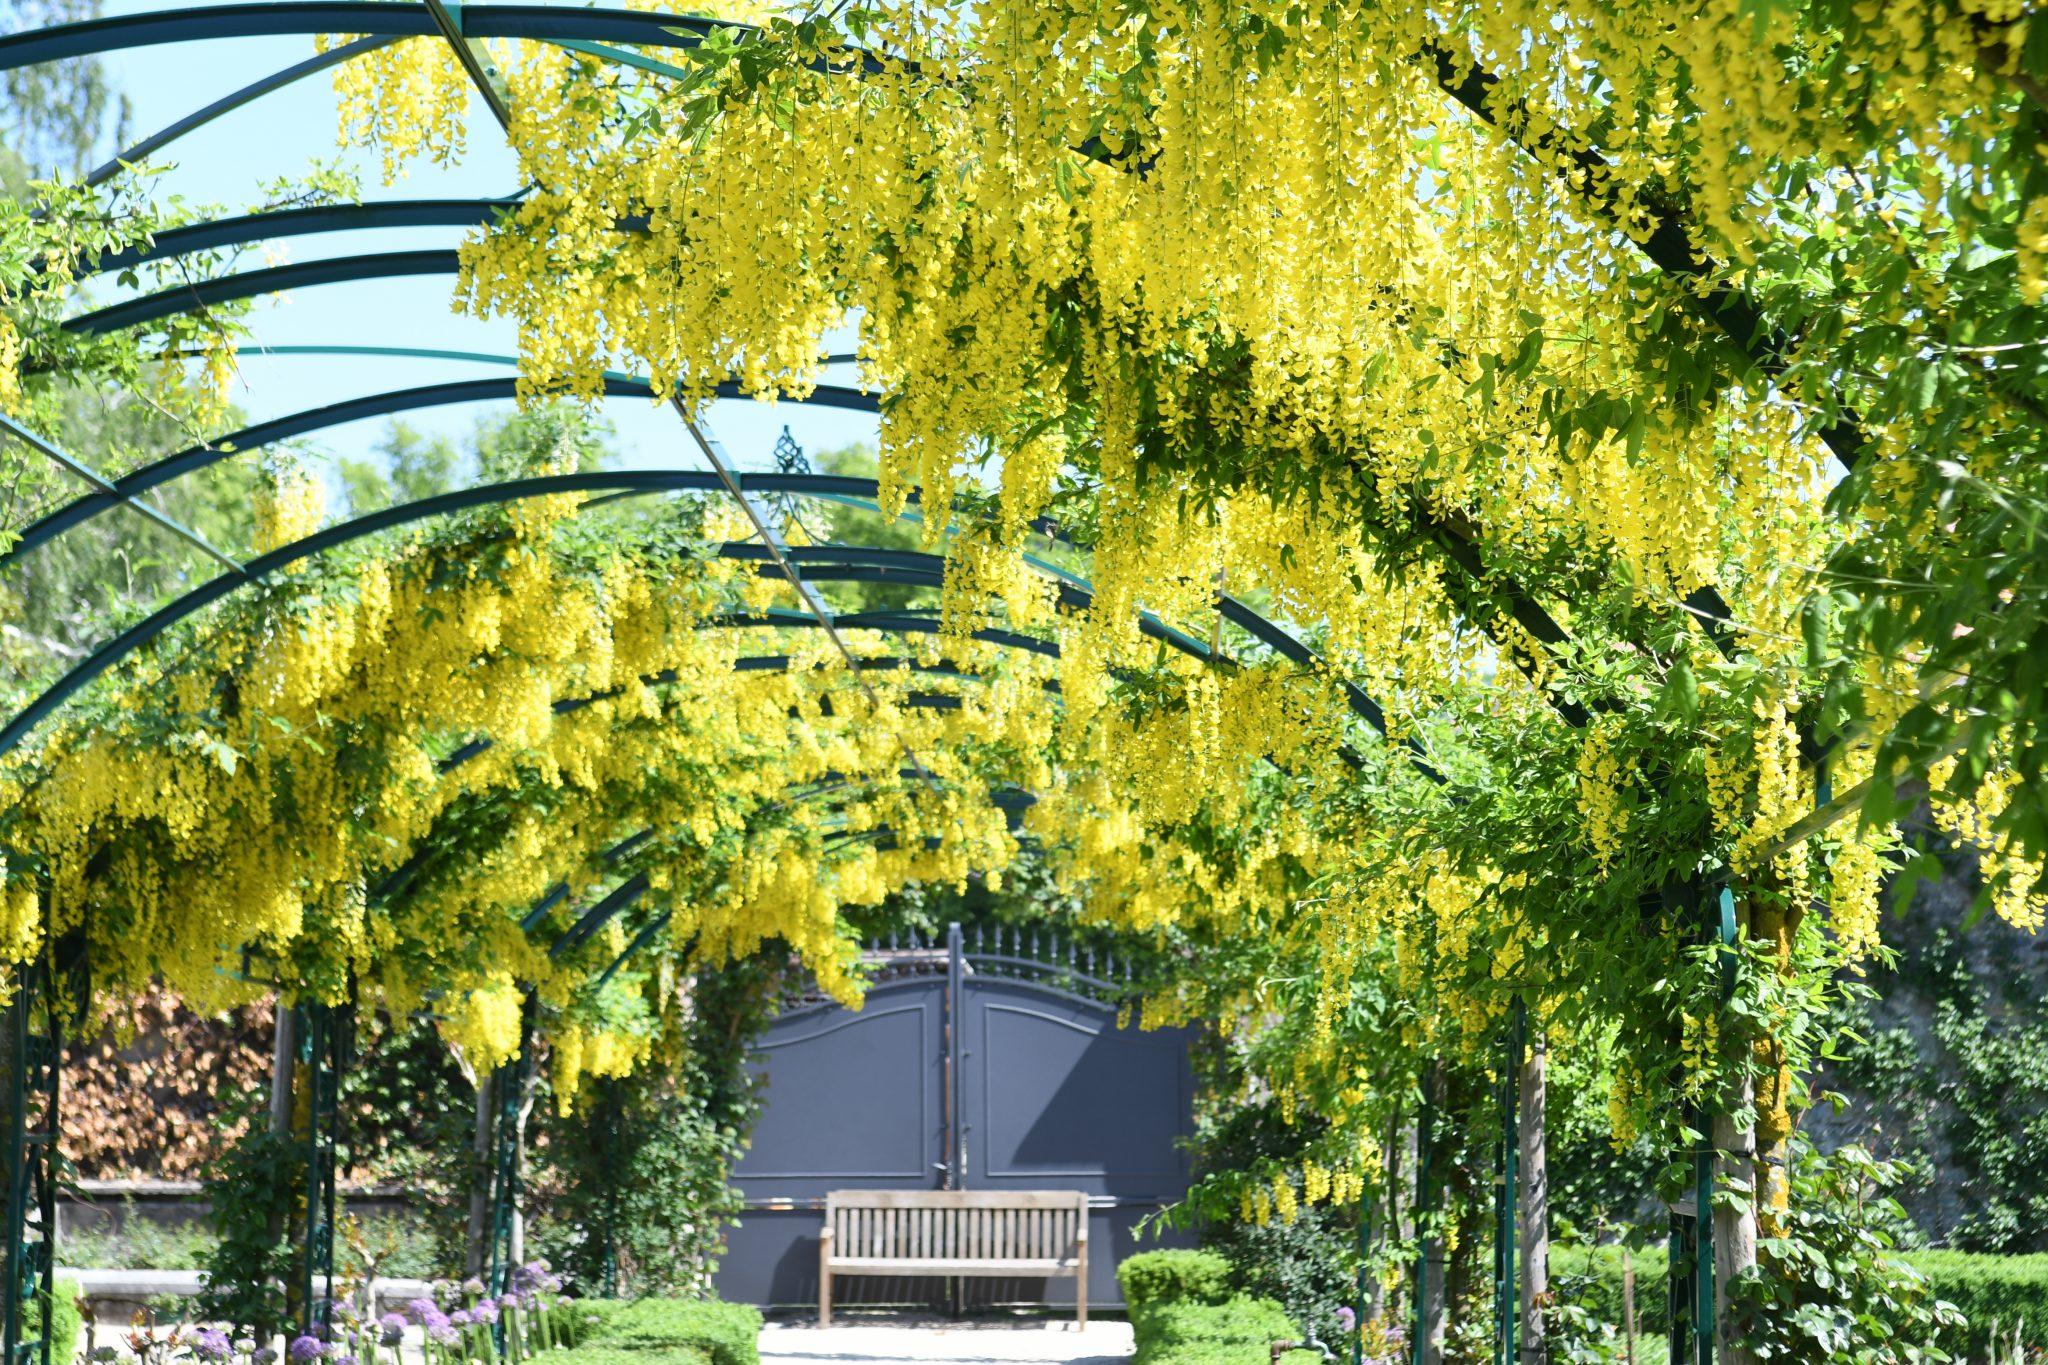 Le tunnel laburnum jaune vif dans le jardin de Doreen.